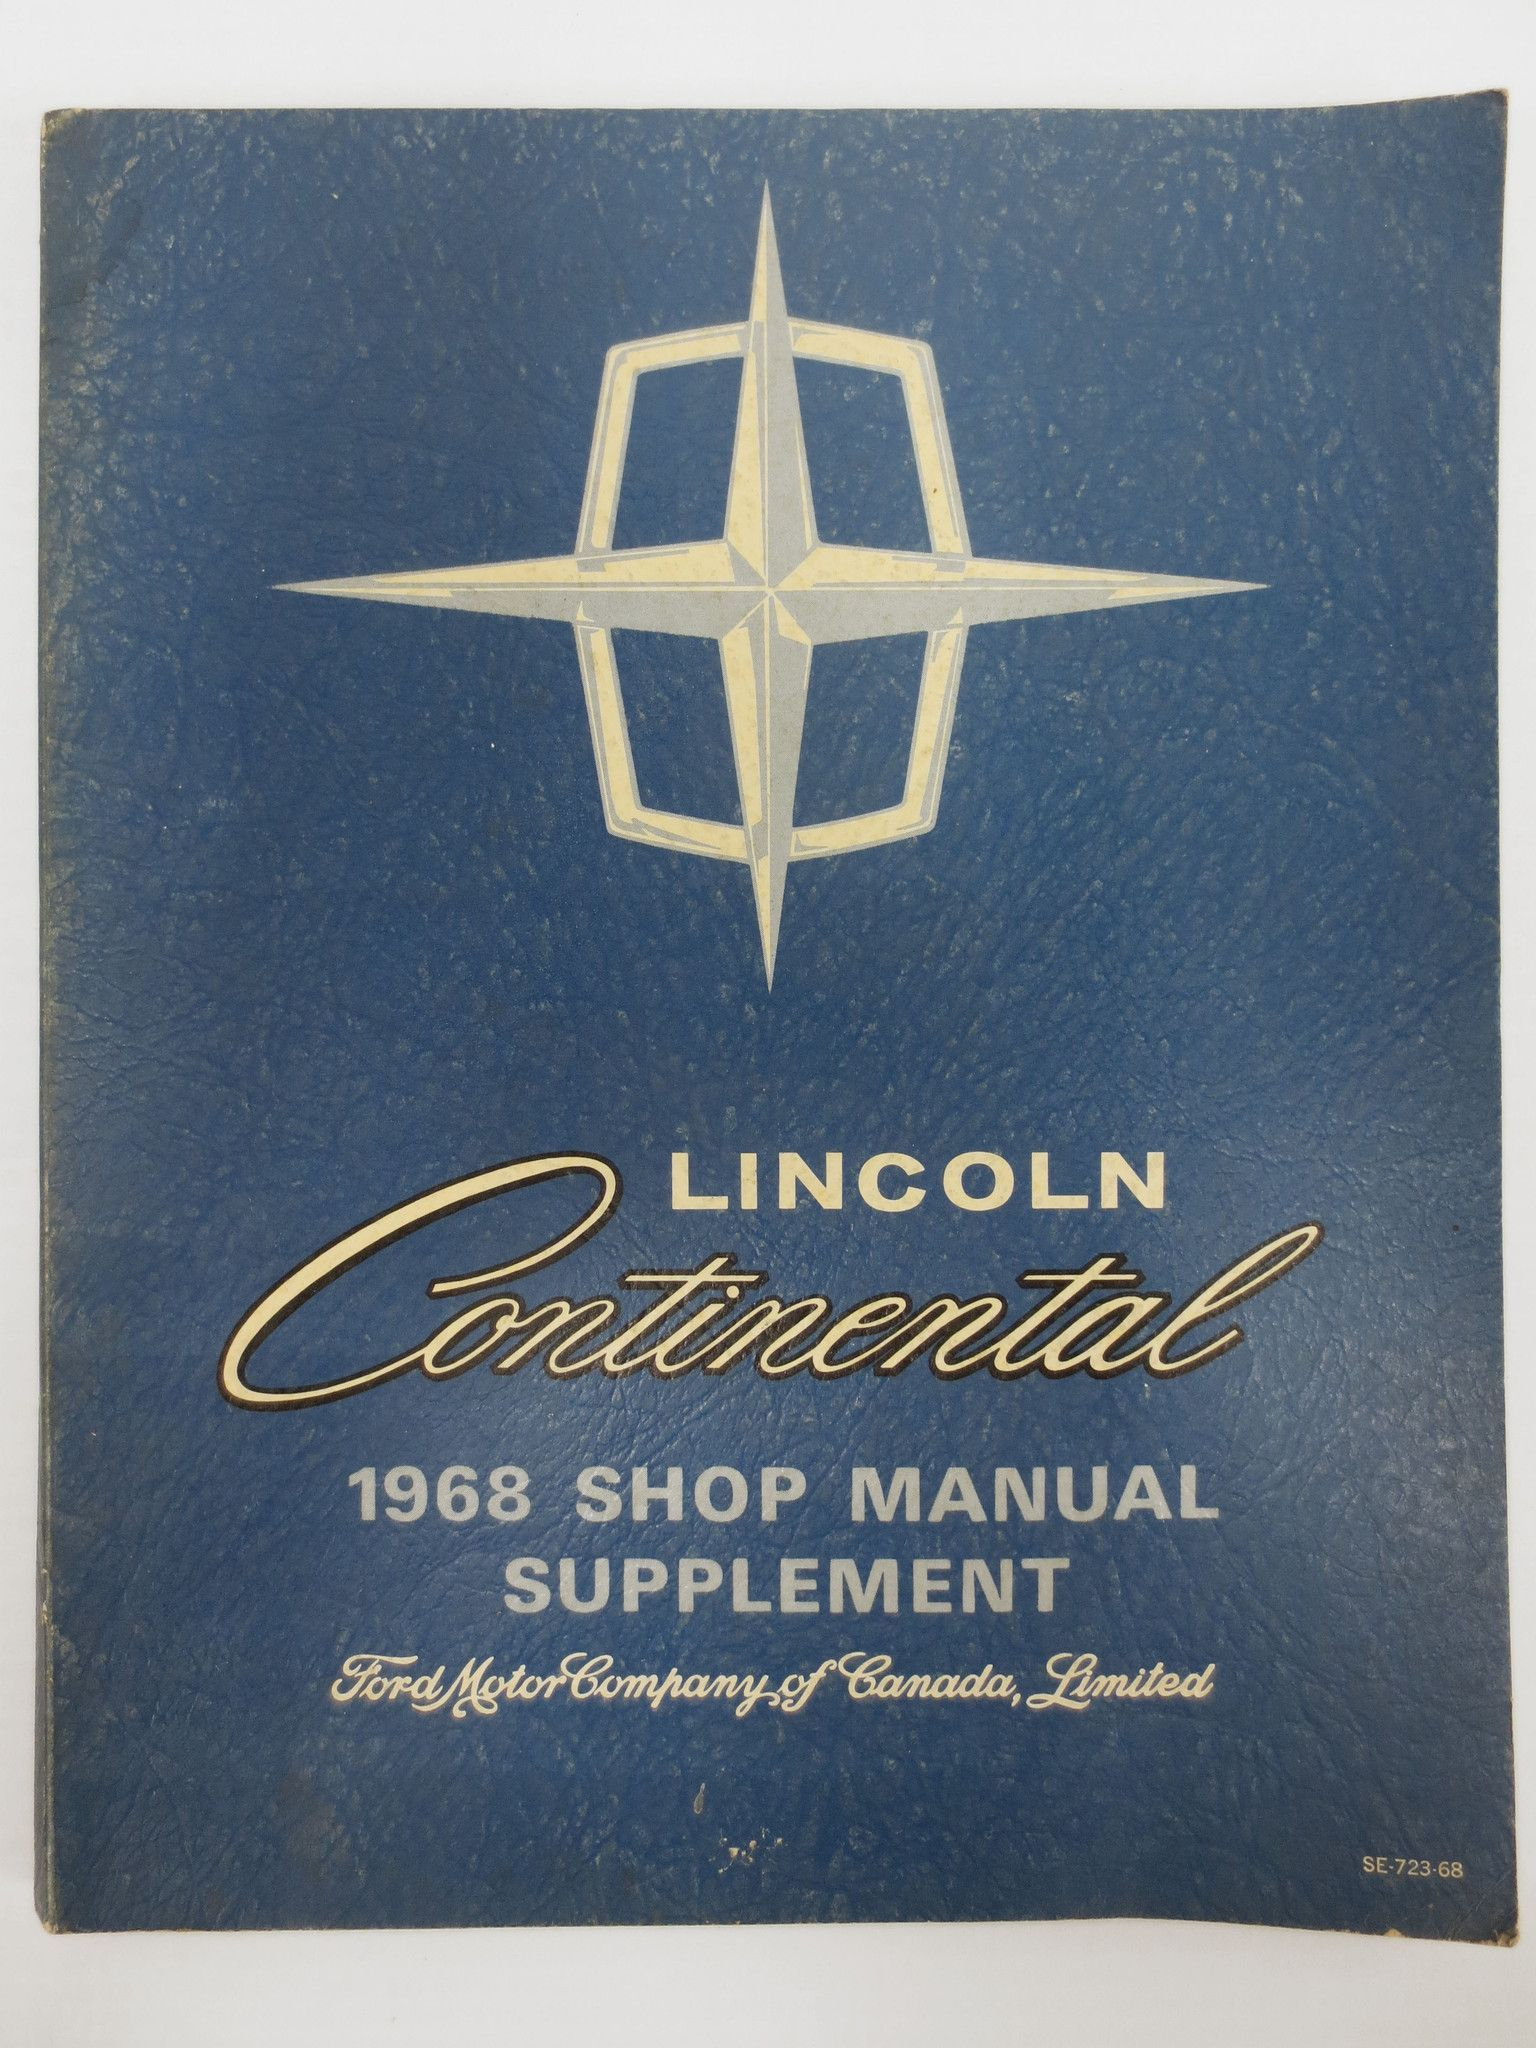 Vintage 1968 Lincoln Continental Car Shop Manual, Ford Motor Car Manual